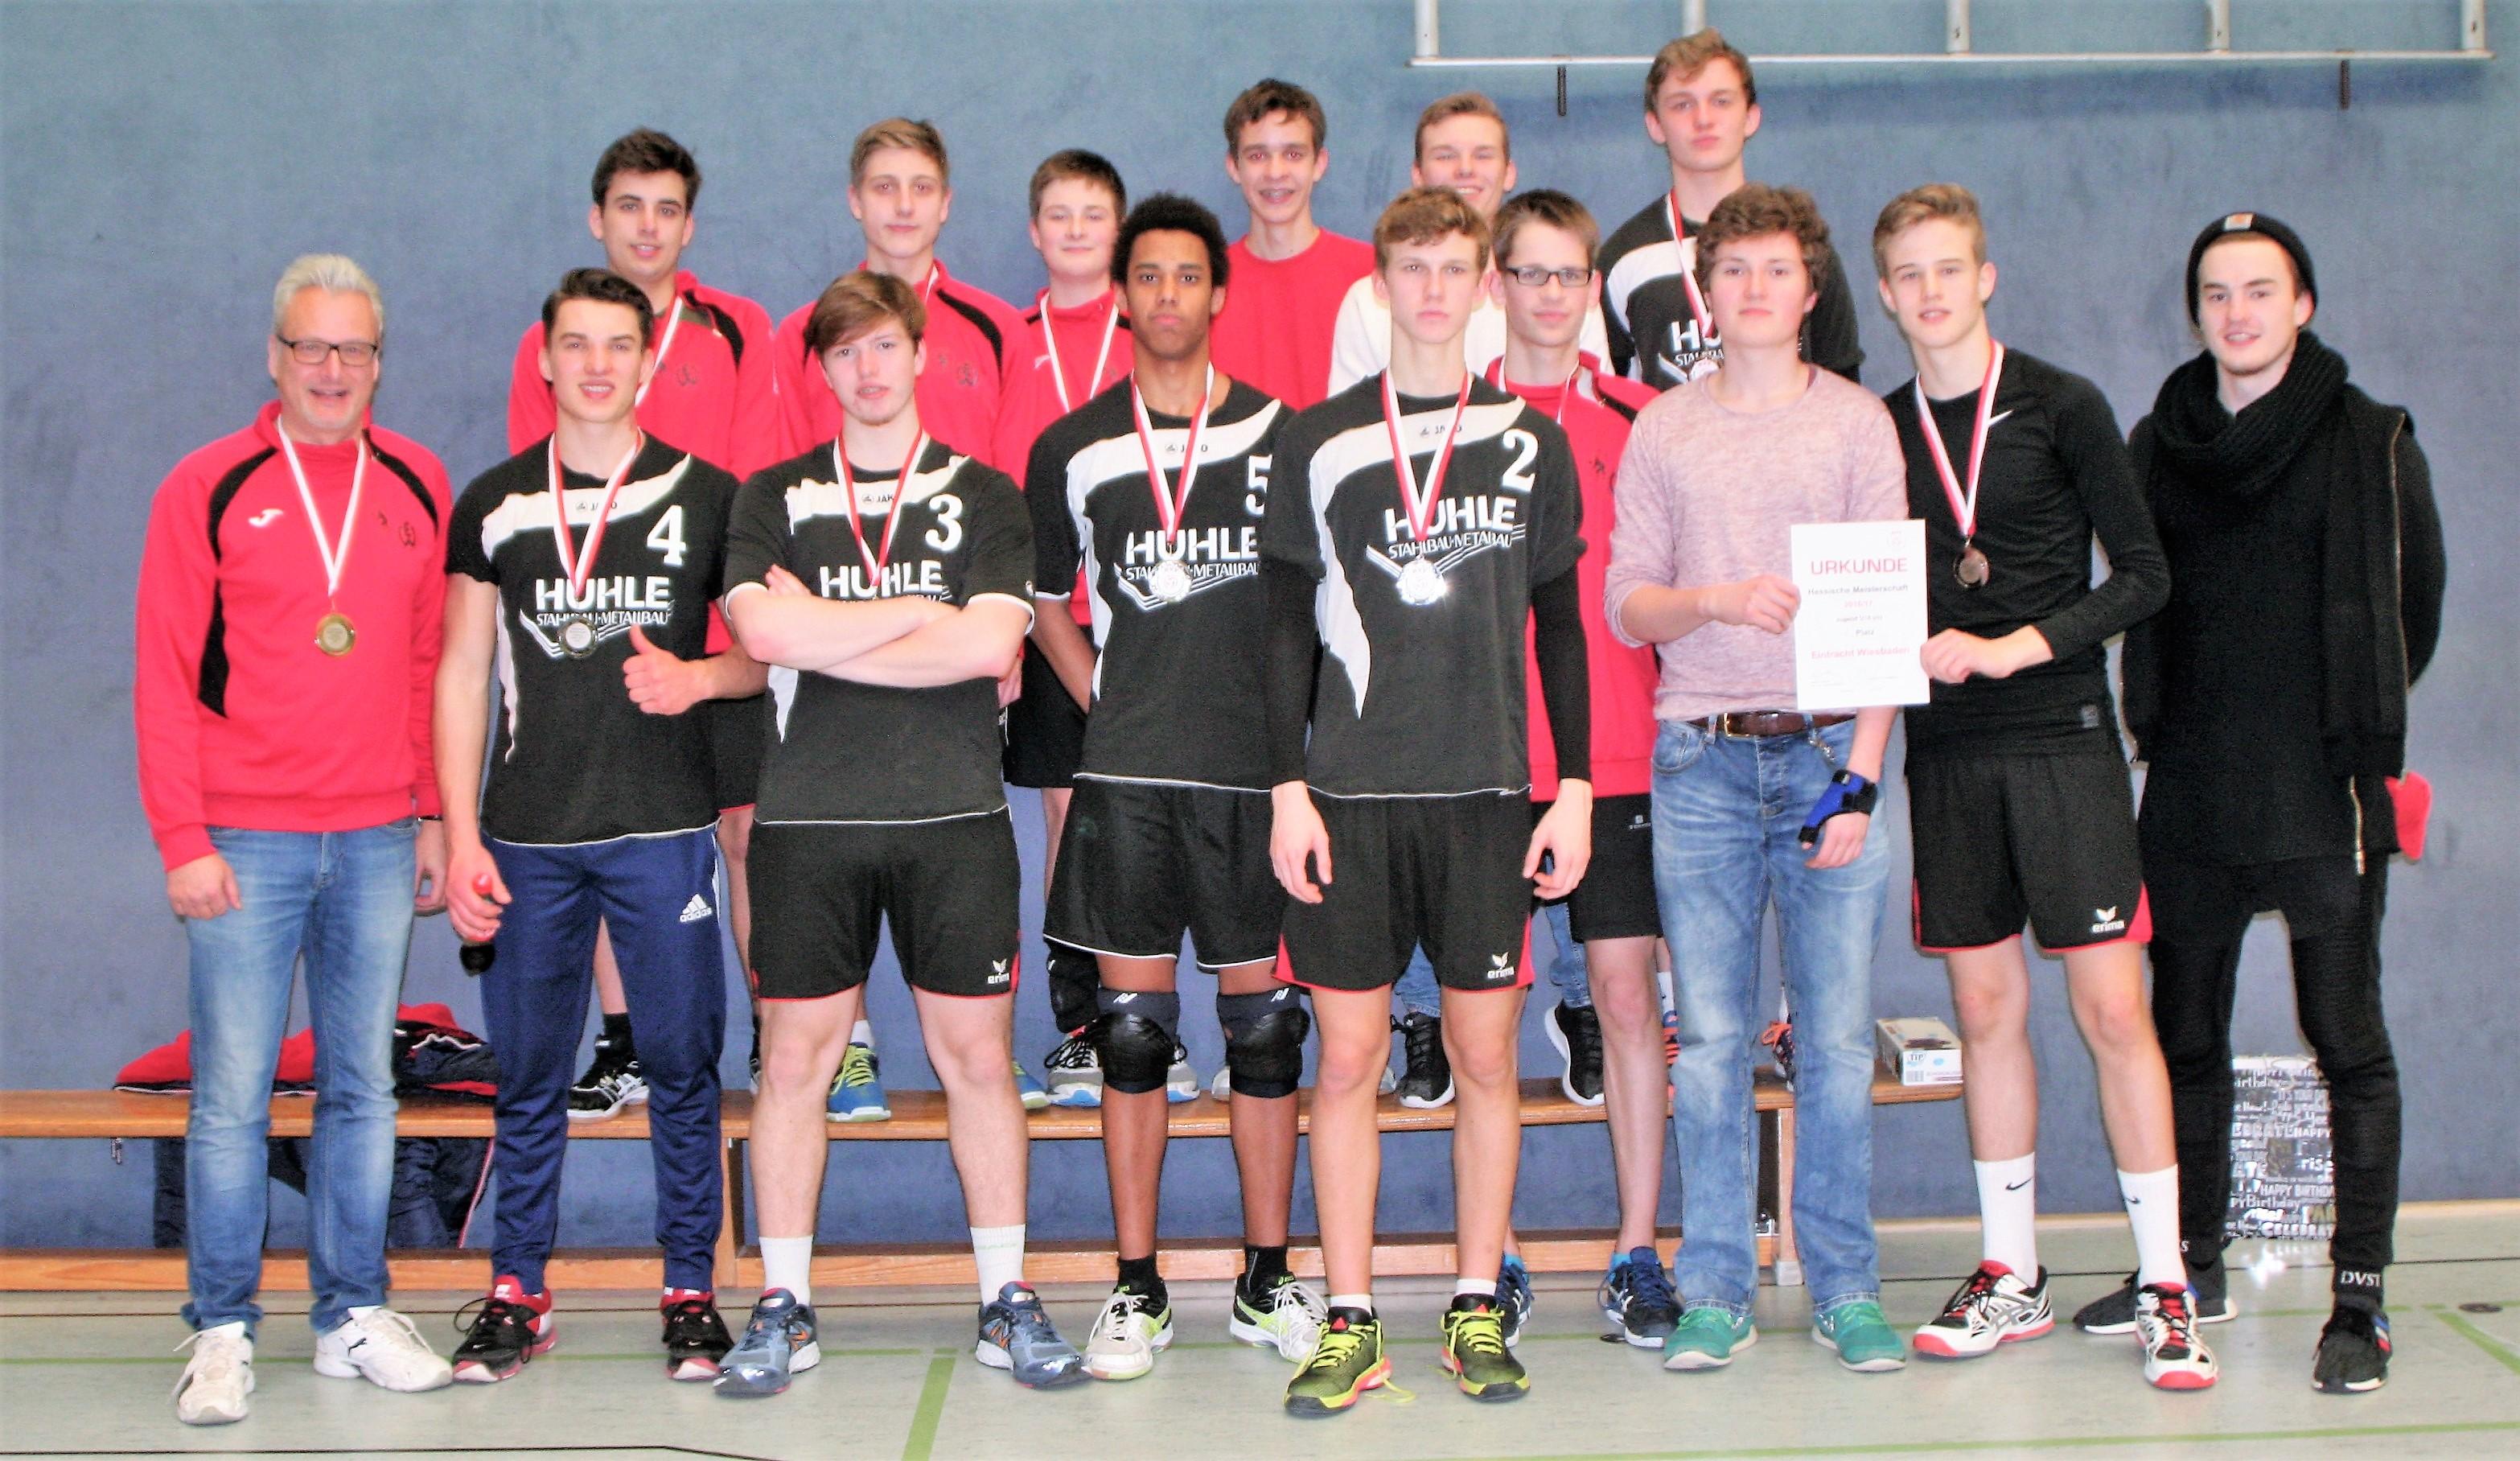 Spannende Hessenmeisterschaft in Wiesbaden